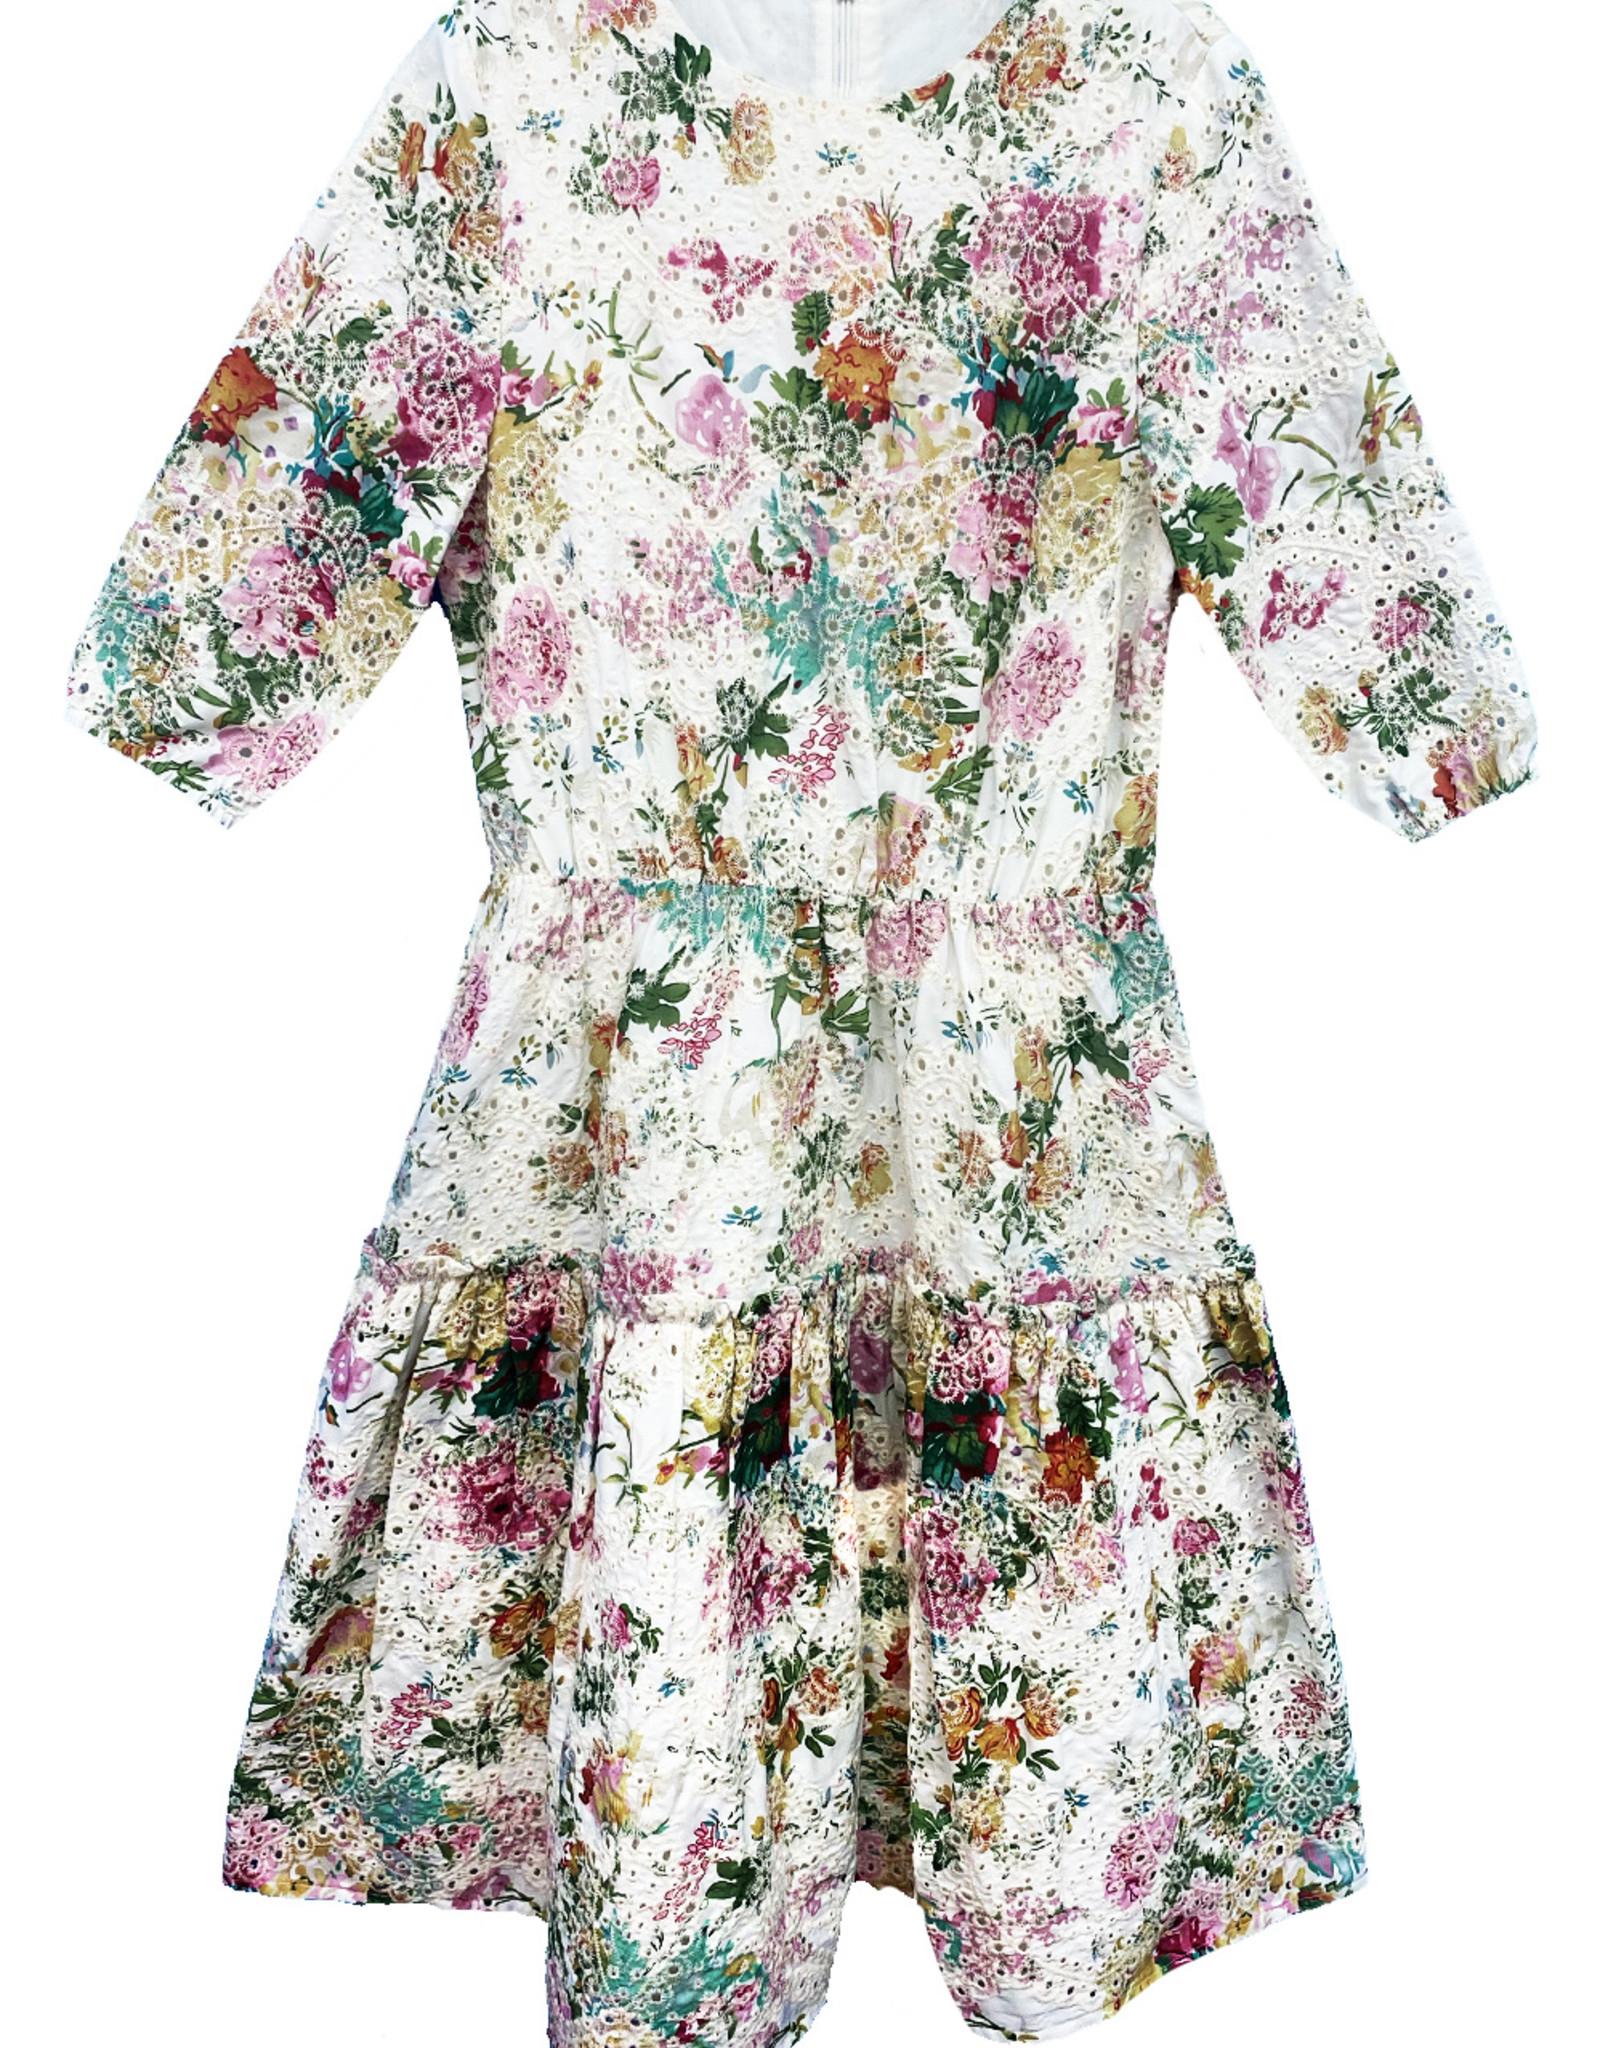 MeMe MeMe Floral Eyelet Dress with Tiered Bottom